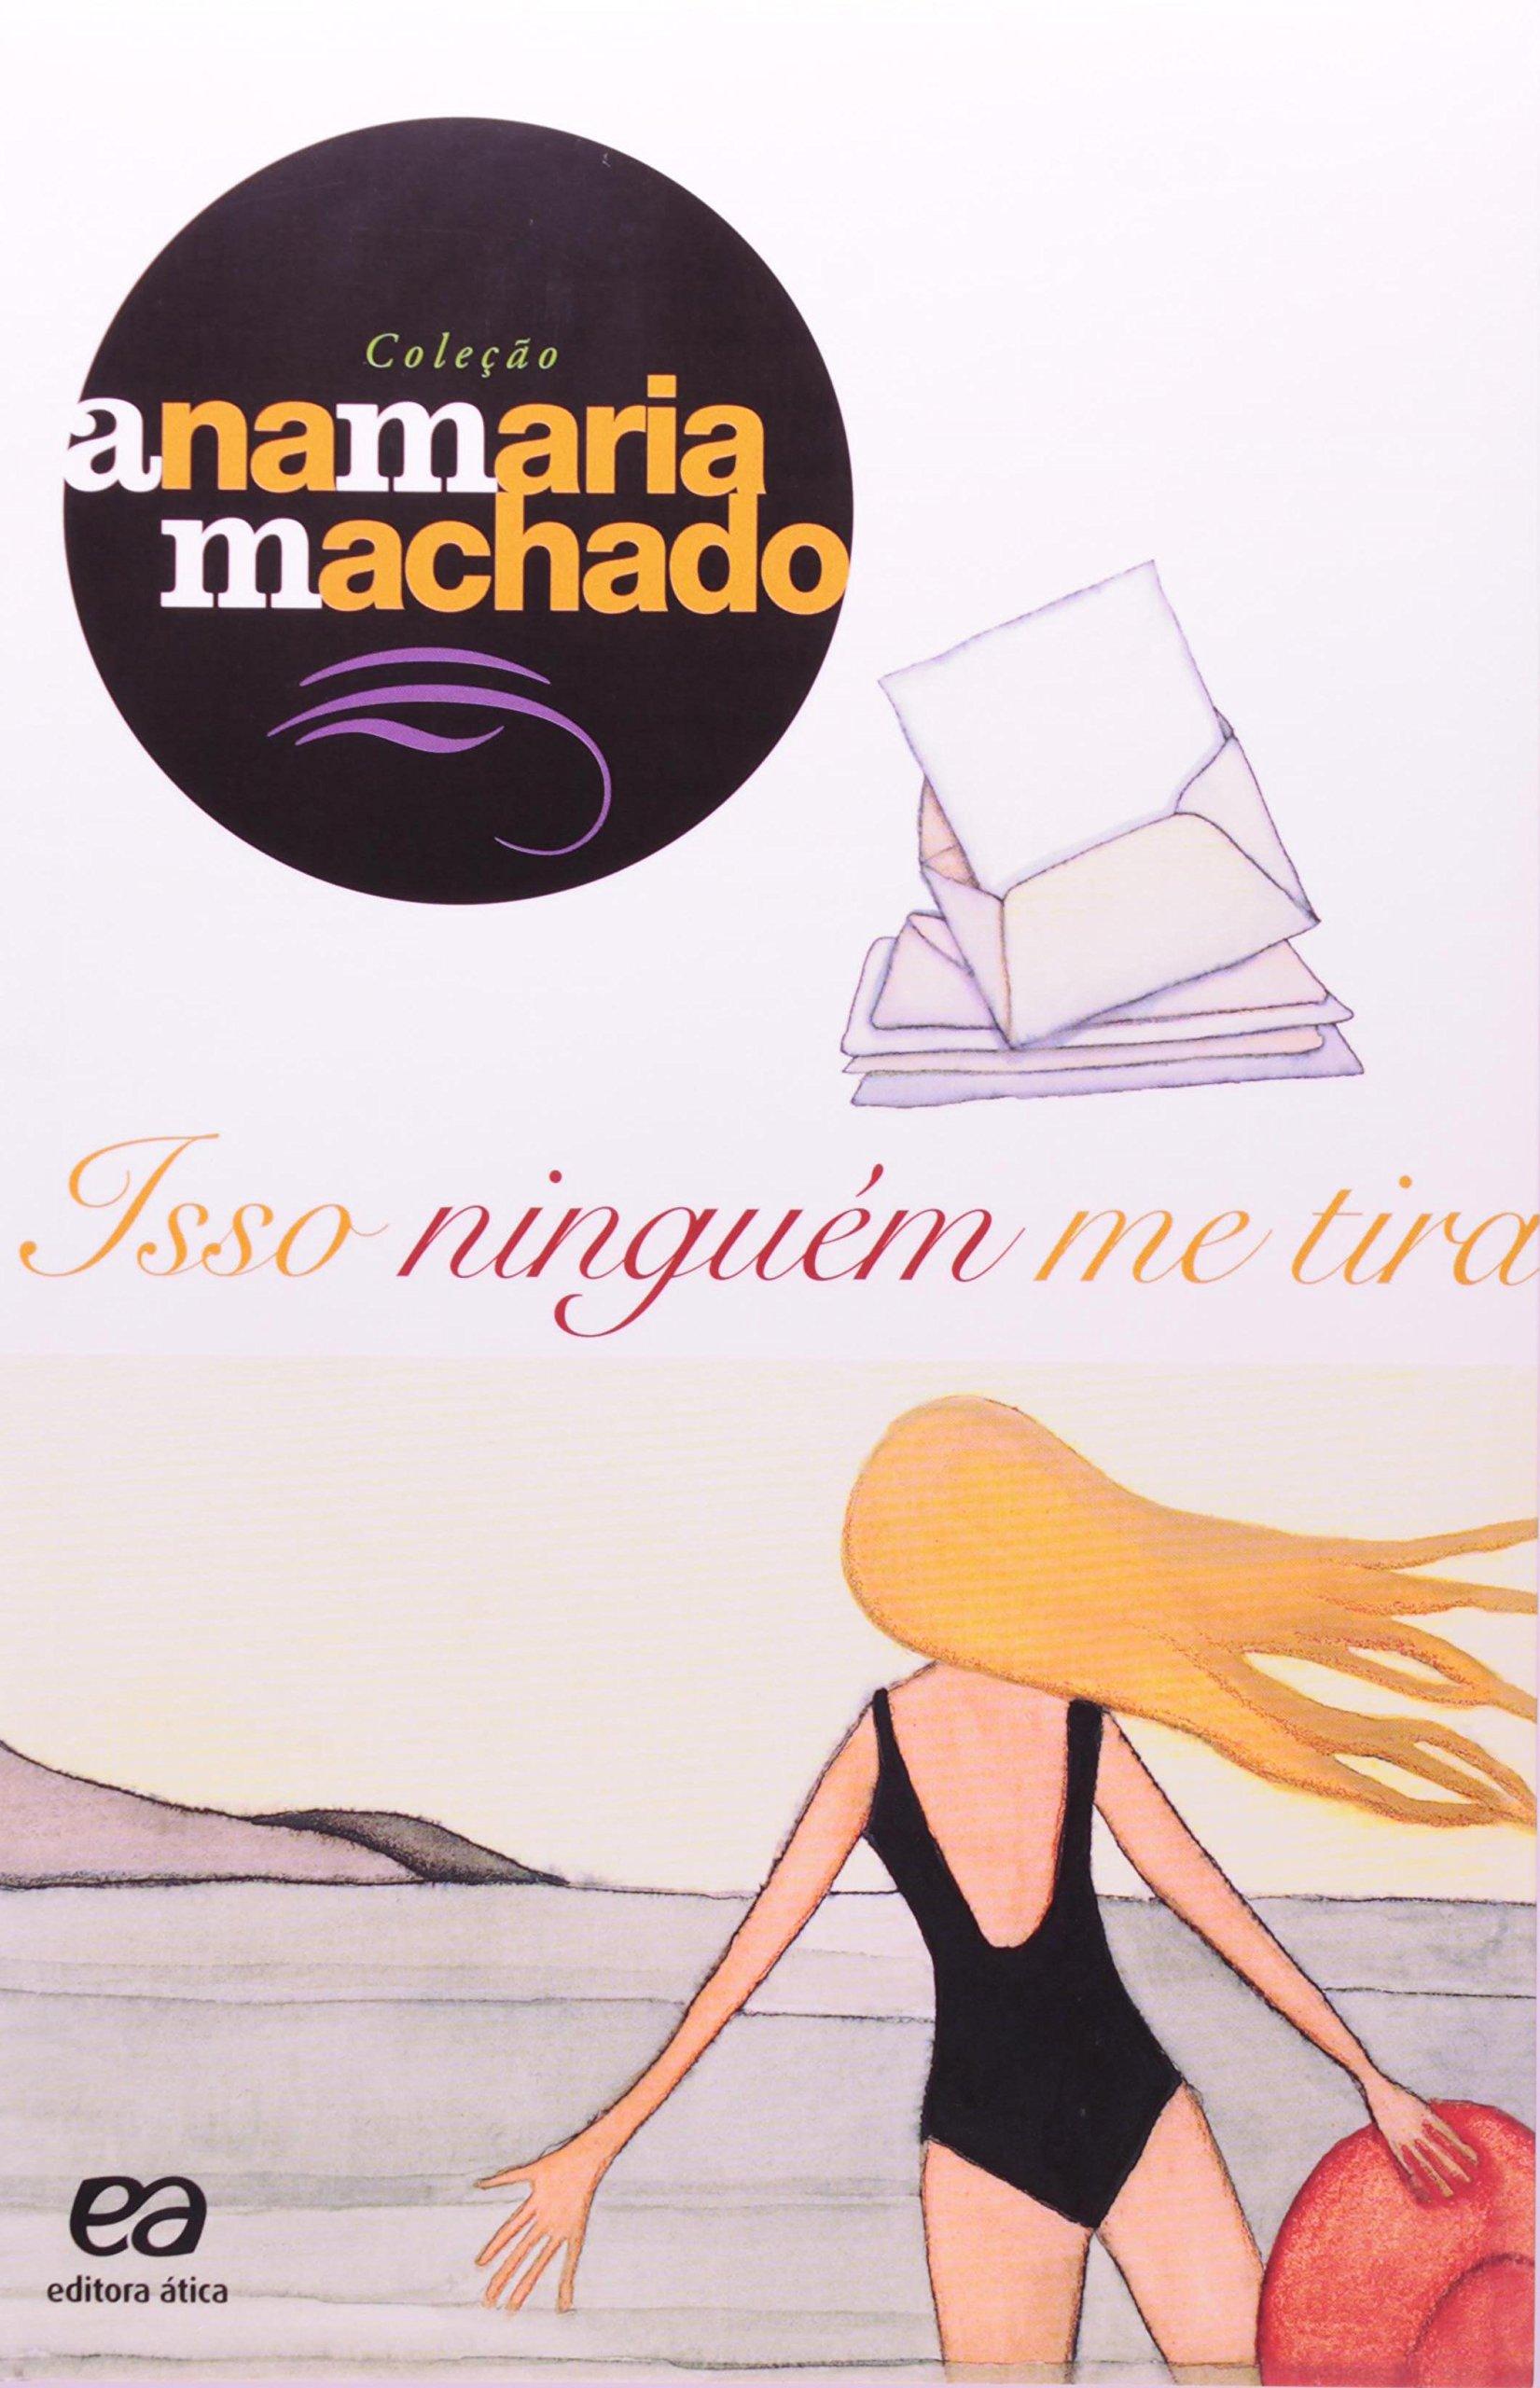 Read Online Isso Ninguem me Tira - Colecao Ana Maria Machado pdf epub